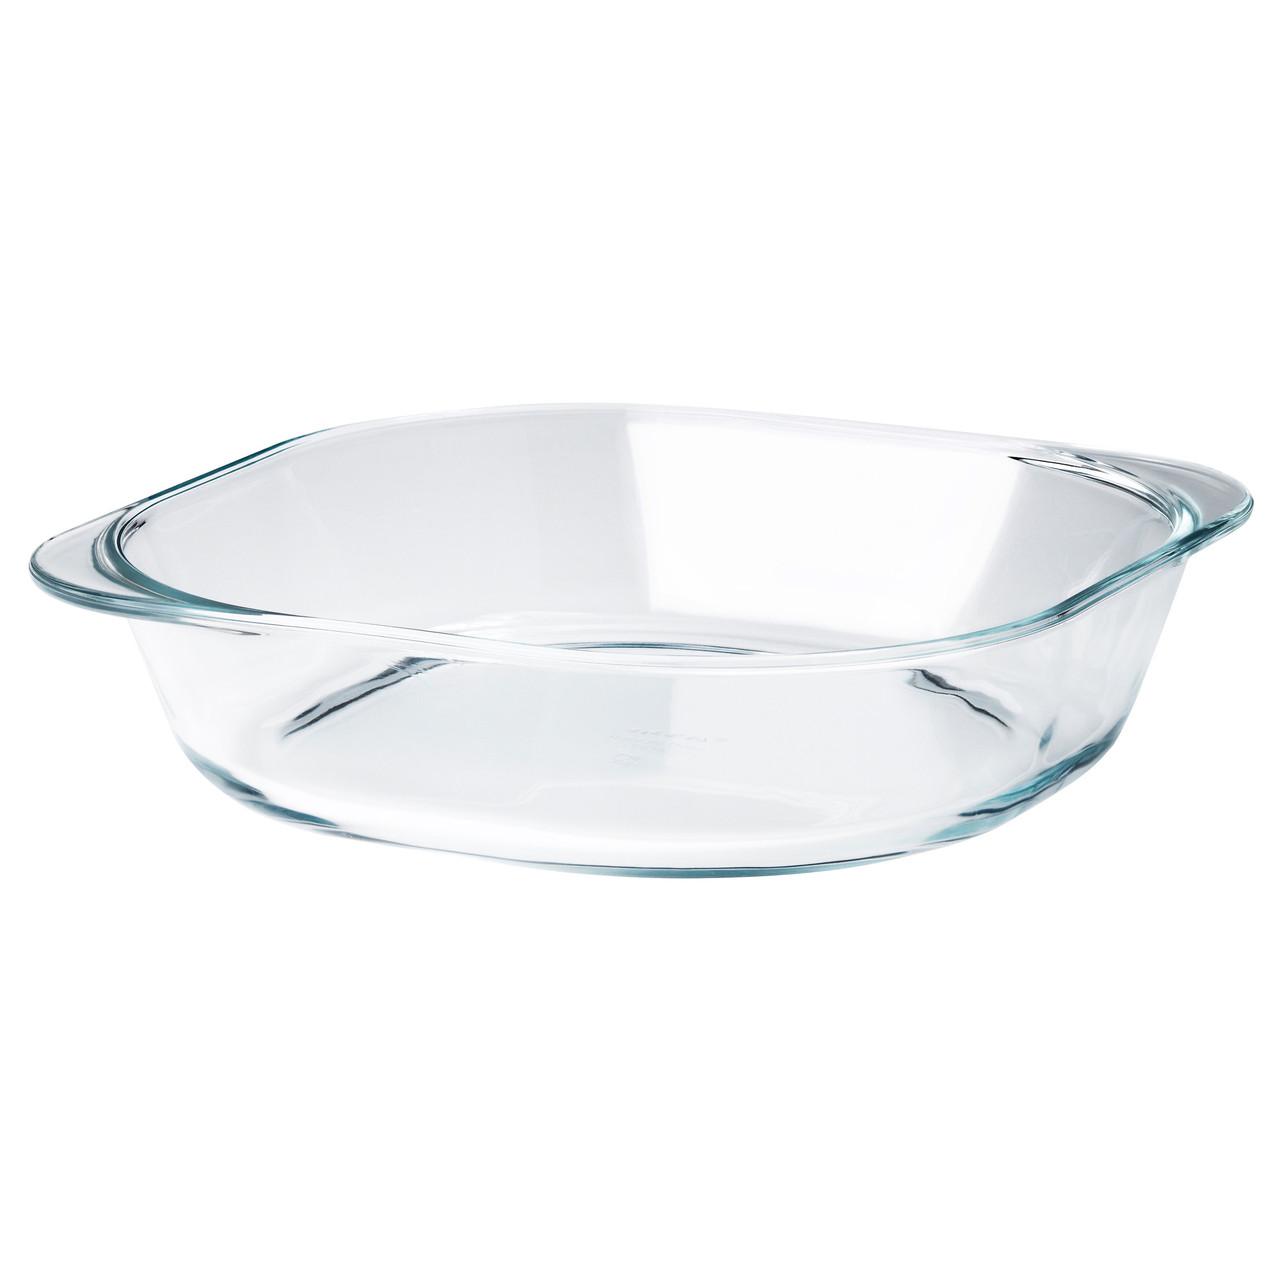 ФОЛЬСАМ Форма для духовки, прозрачное стекло, 24.5x24.5 см 50311269 IK